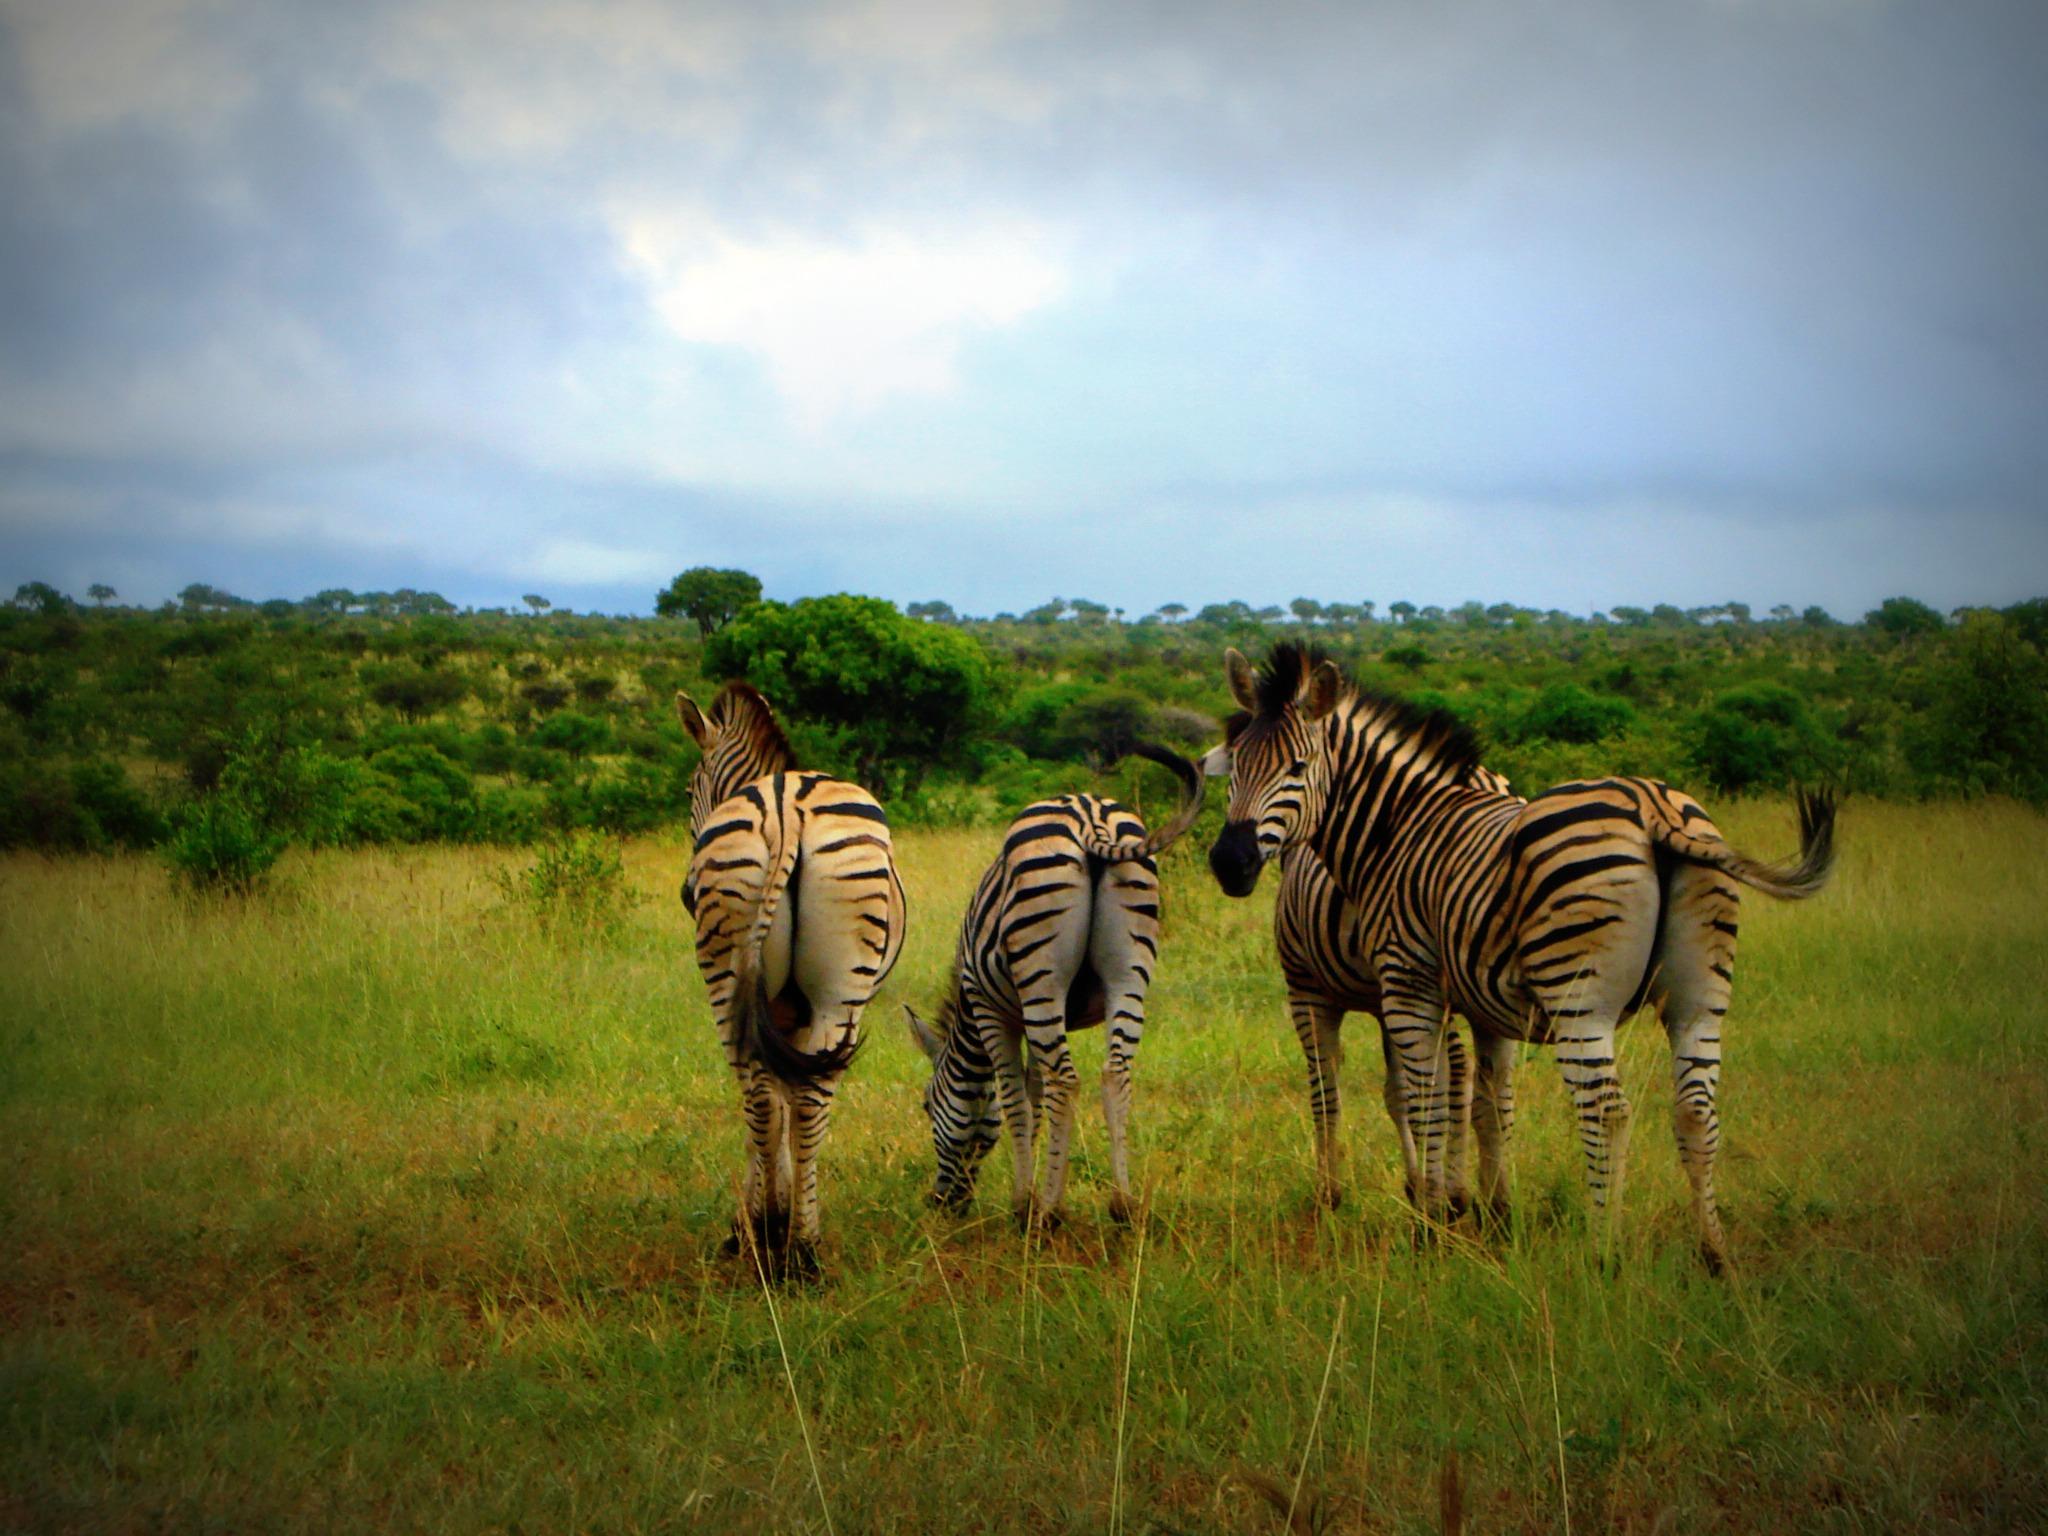 zebra wildlife south africa - HD2048×1536